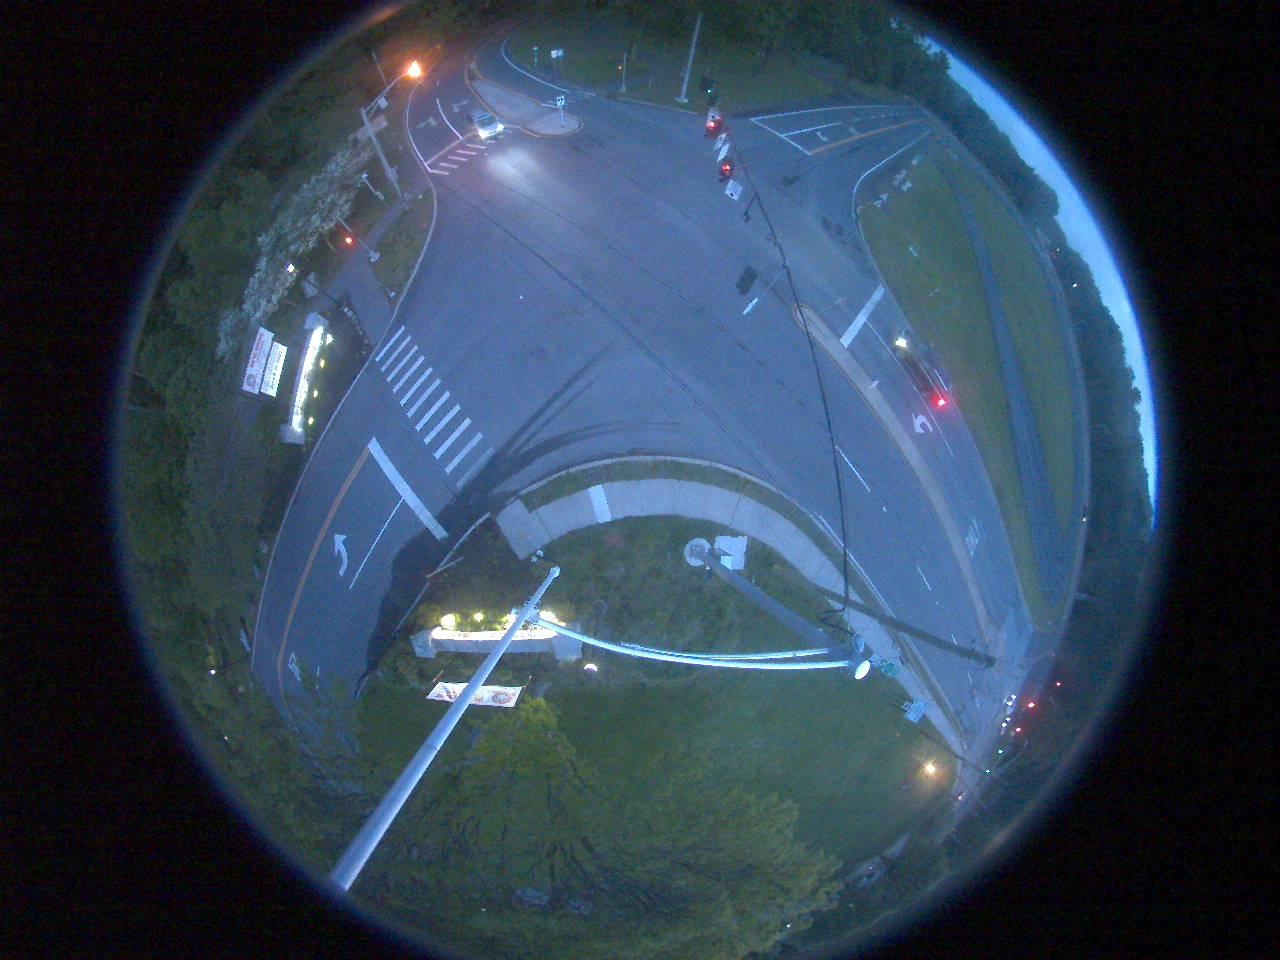 I-90 at Interchange 41 (Waterloo) (3ml32041e) - USA